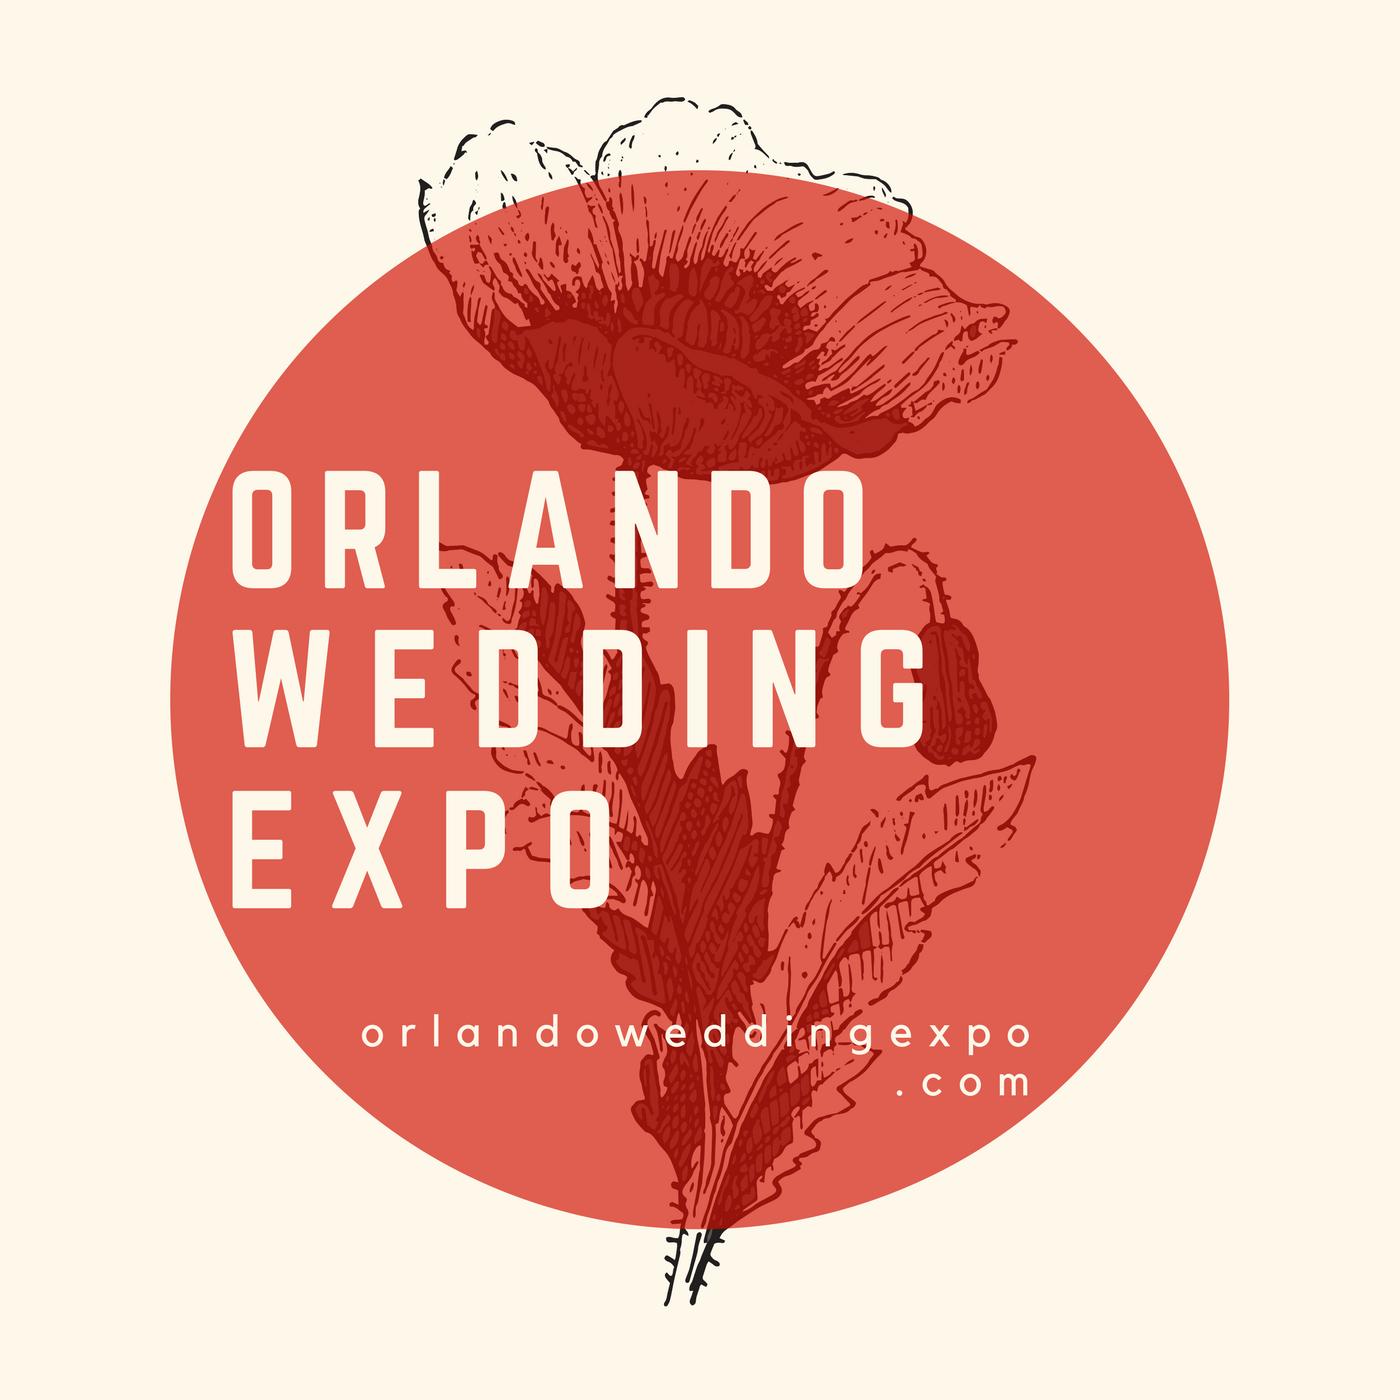 orlando wedding expo show wedding planning experience guide aloft perfect wedding